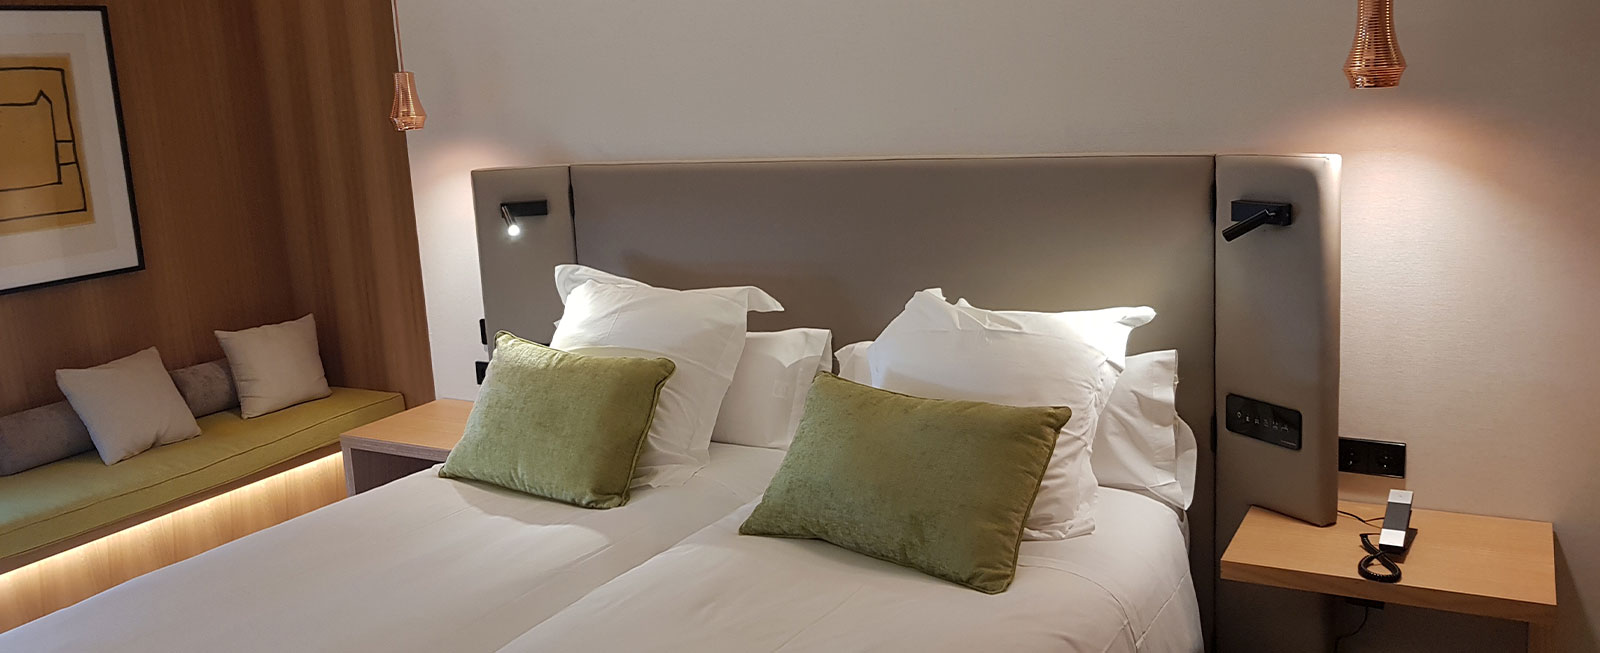 Habitació Doble comunicante-Protur-Naisa-Palma-hotel